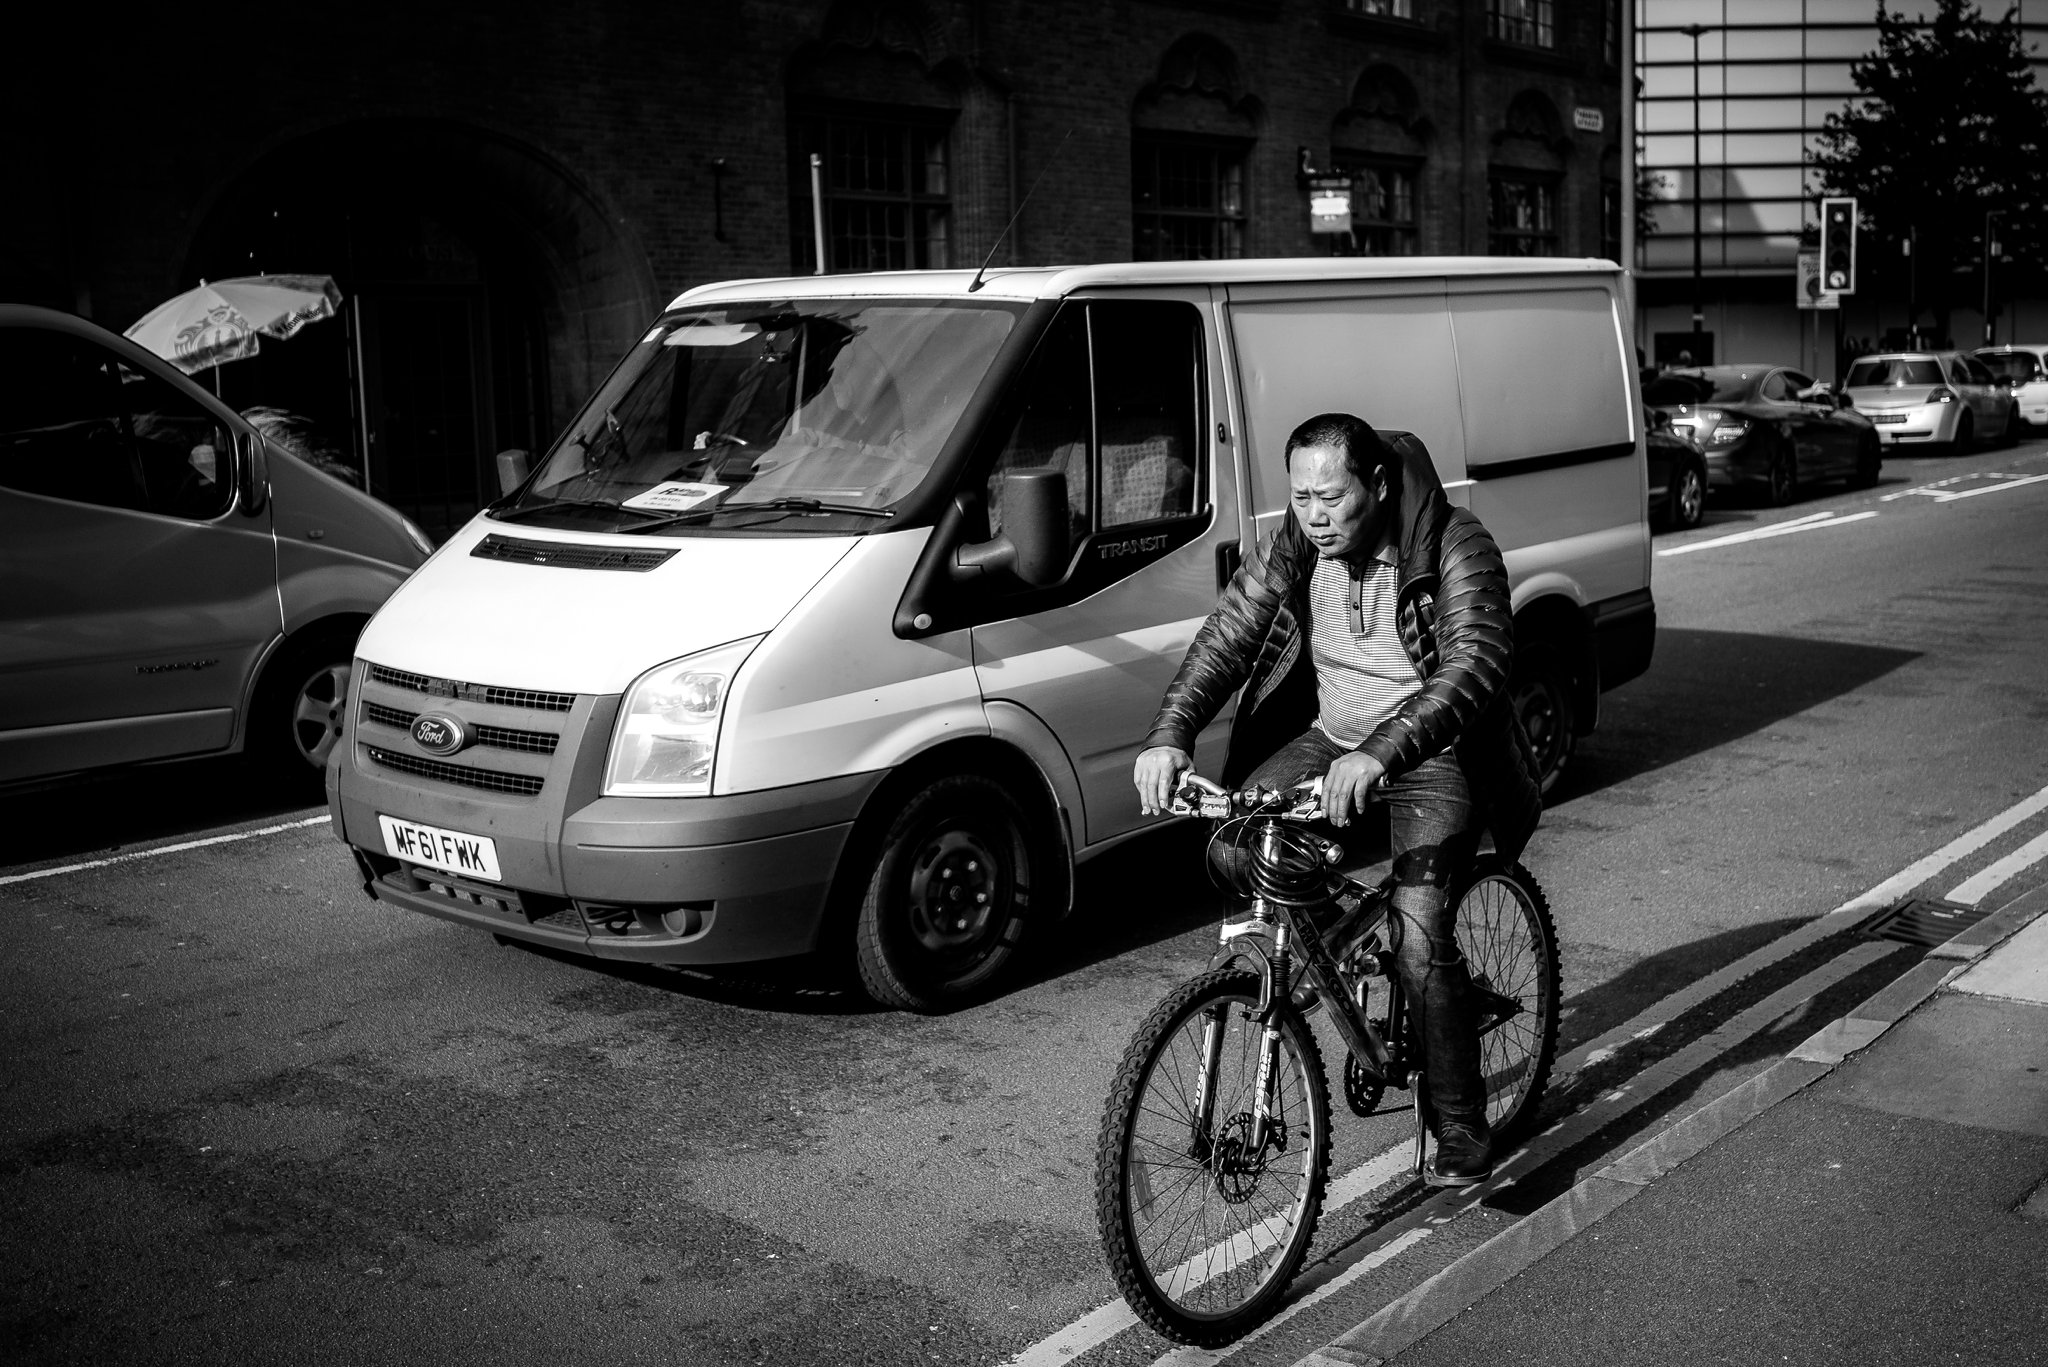 liverpool-street-photography_0004.jpg